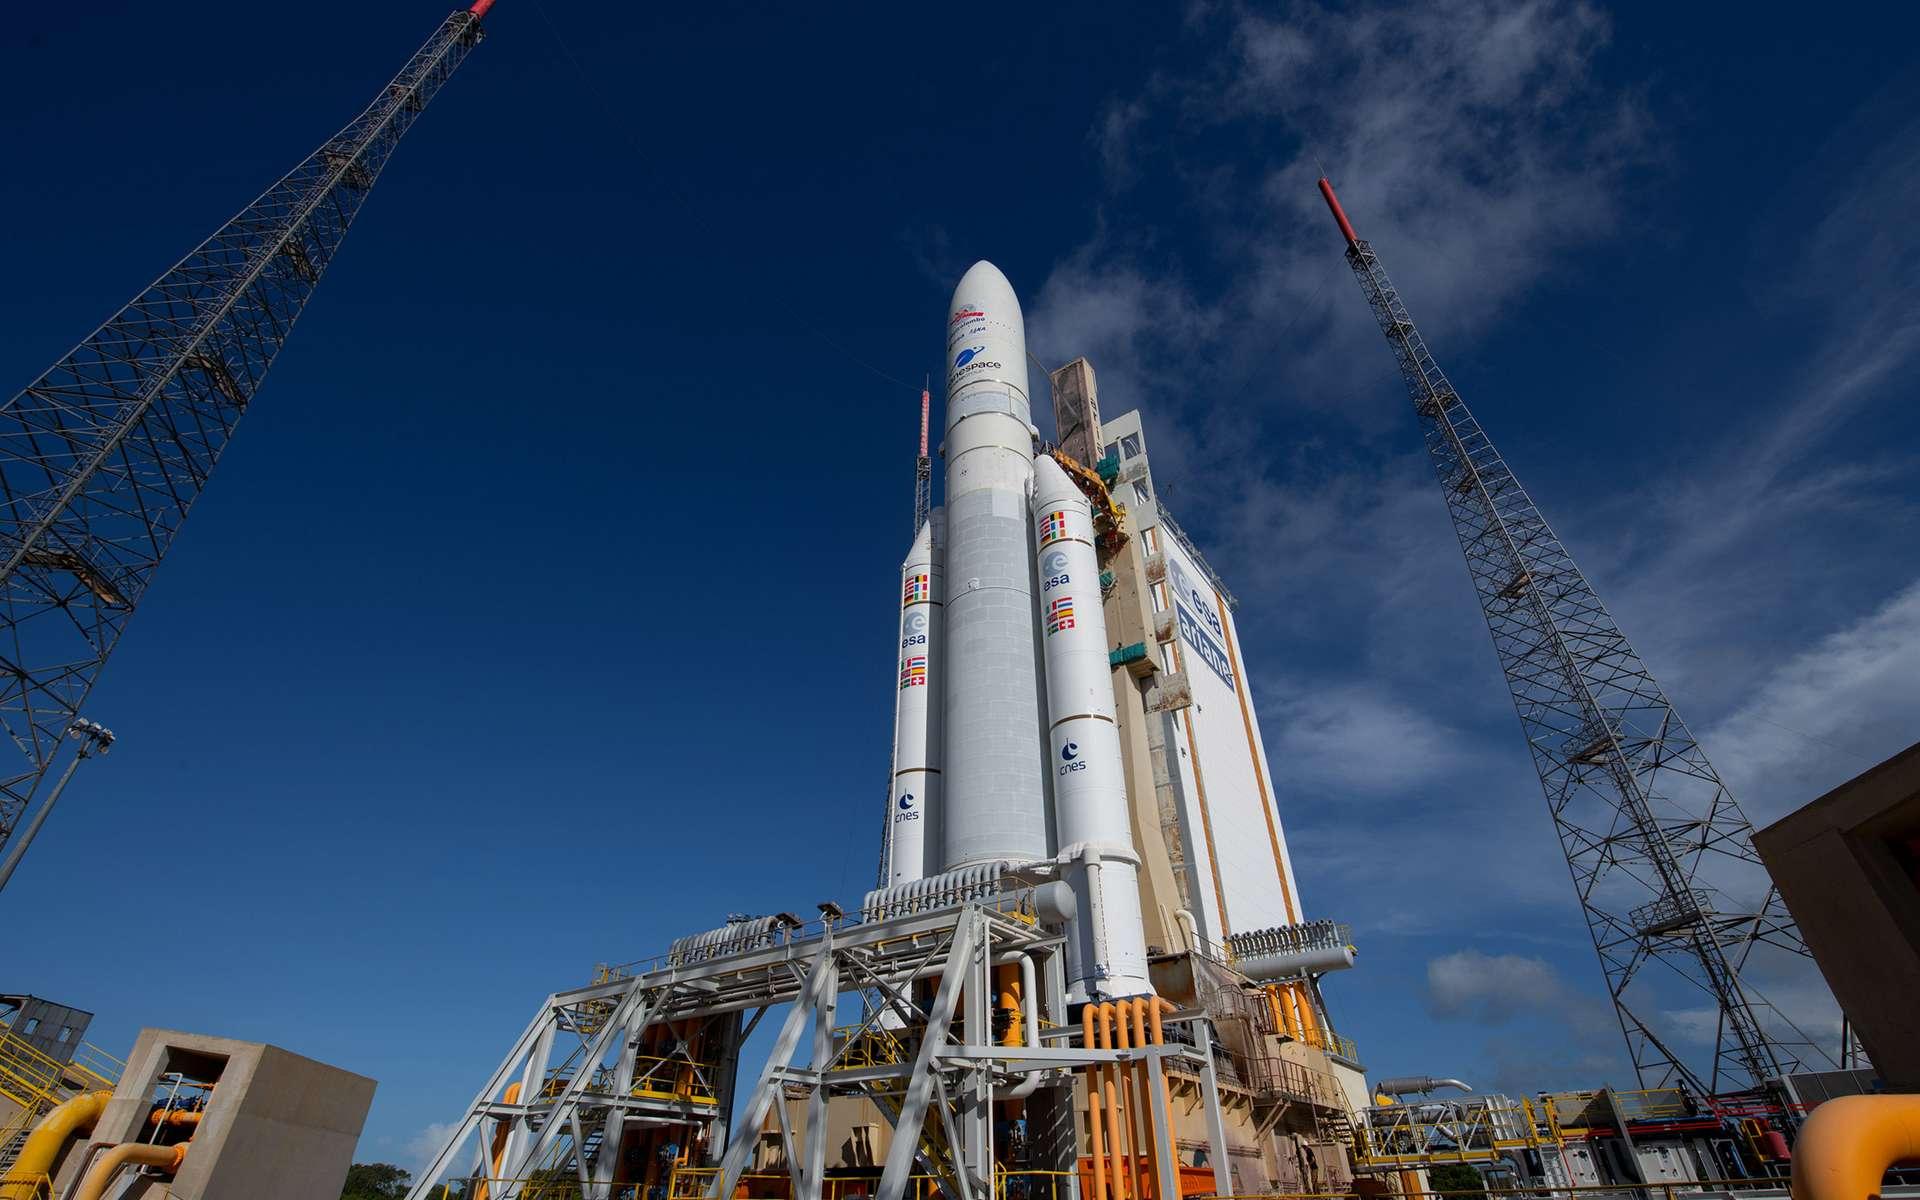 Calendrier Lancement Ariane 2019.Arianespace Une Annee Chargee Avant Un Ralentissement Du